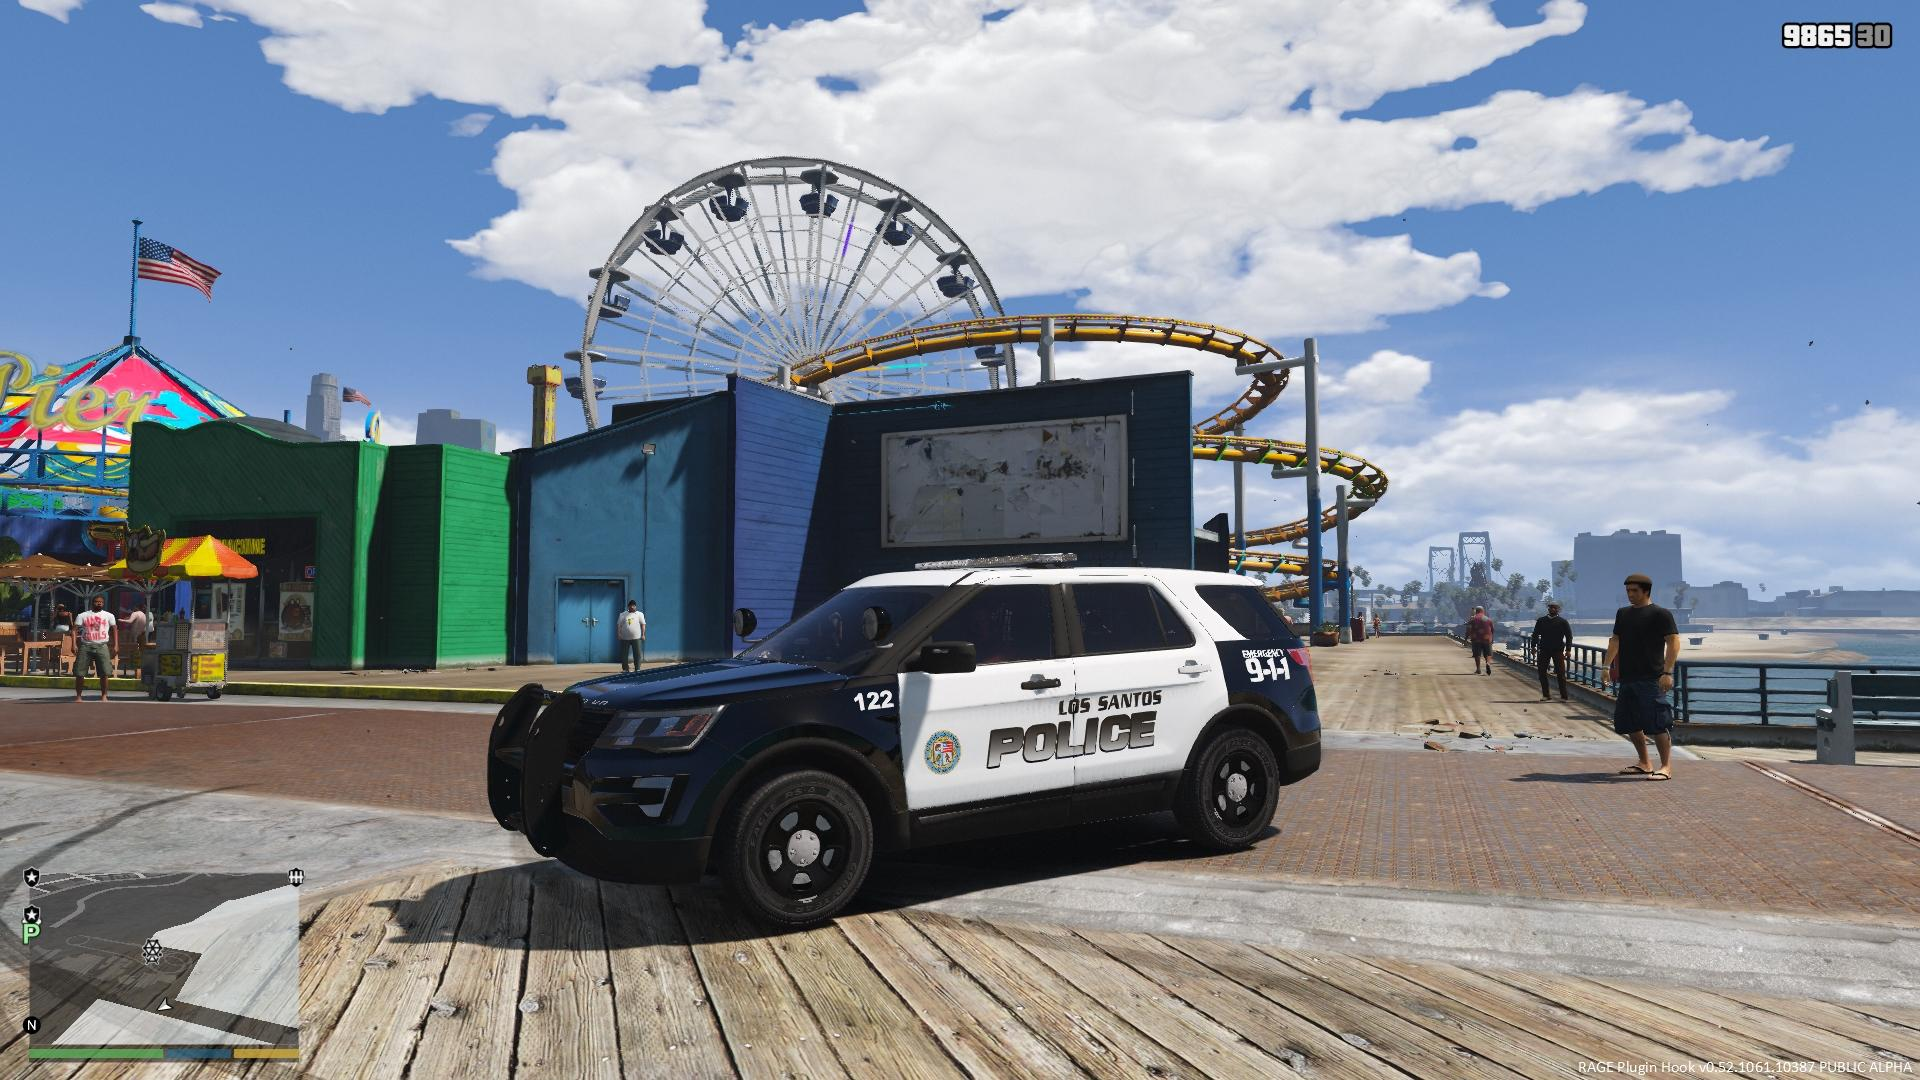 2016 ford police interceptor utility lspd skin based on